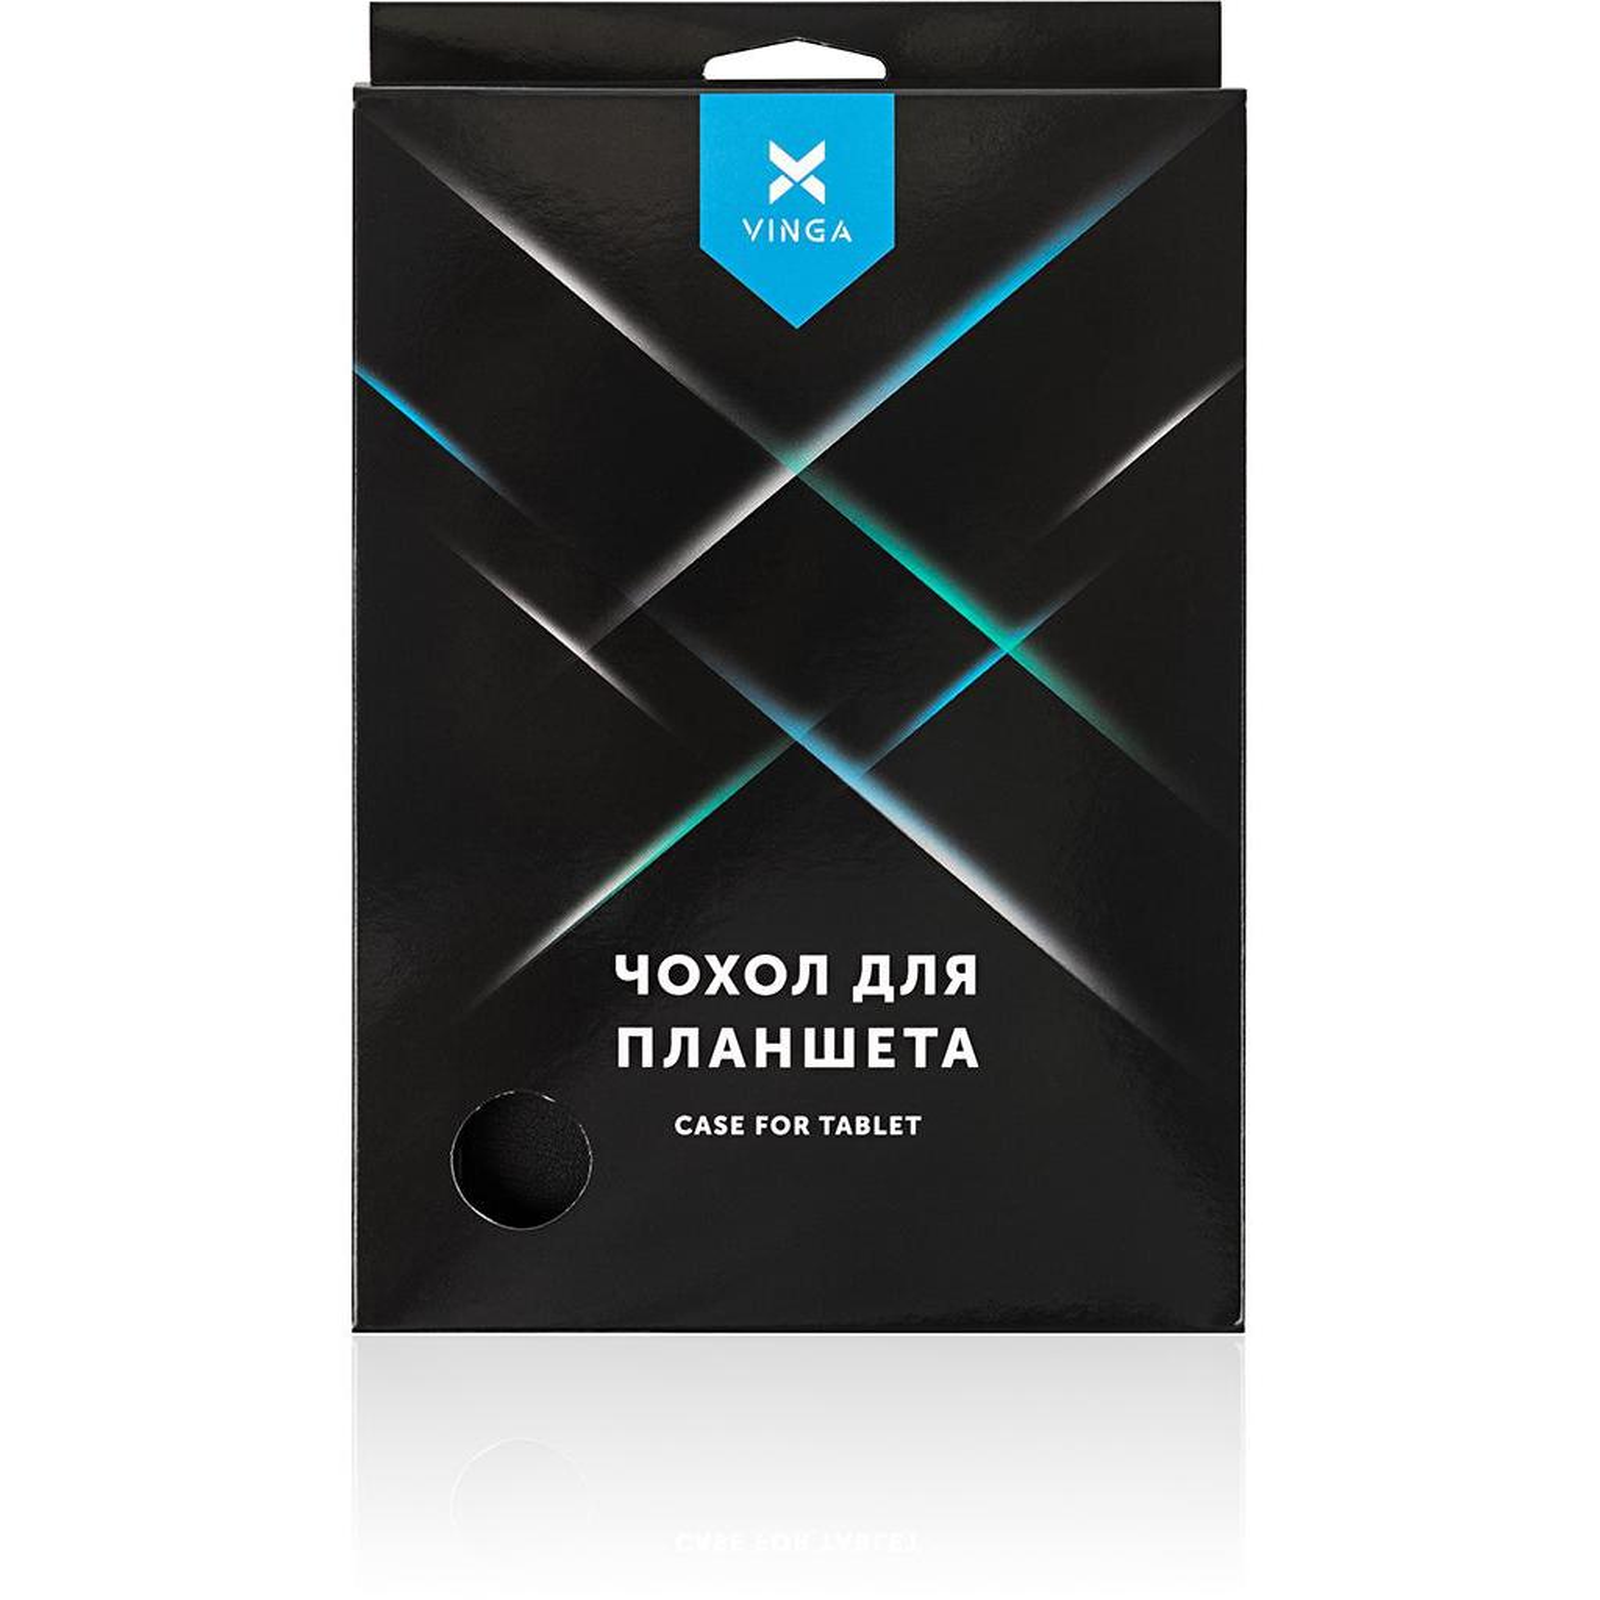 Чехол для планшета Huawei MediaPad T3 10 black Vinga (VNT3753010) изображение 7